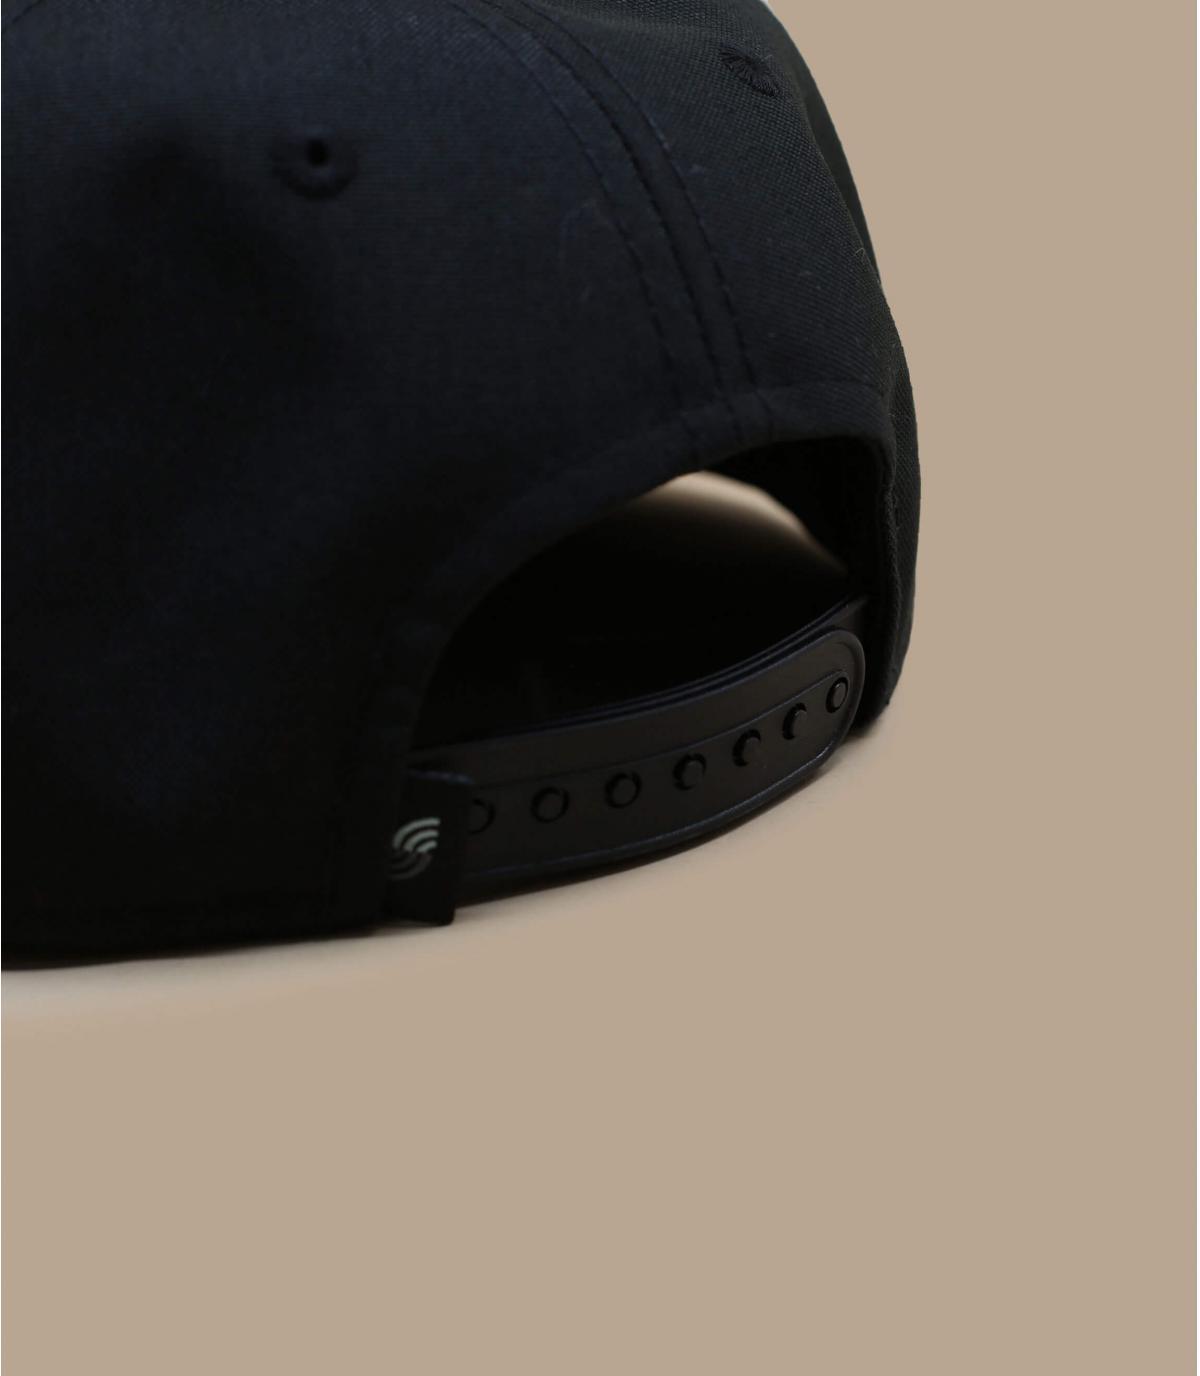 Détails Snapback Recycled black - image 4